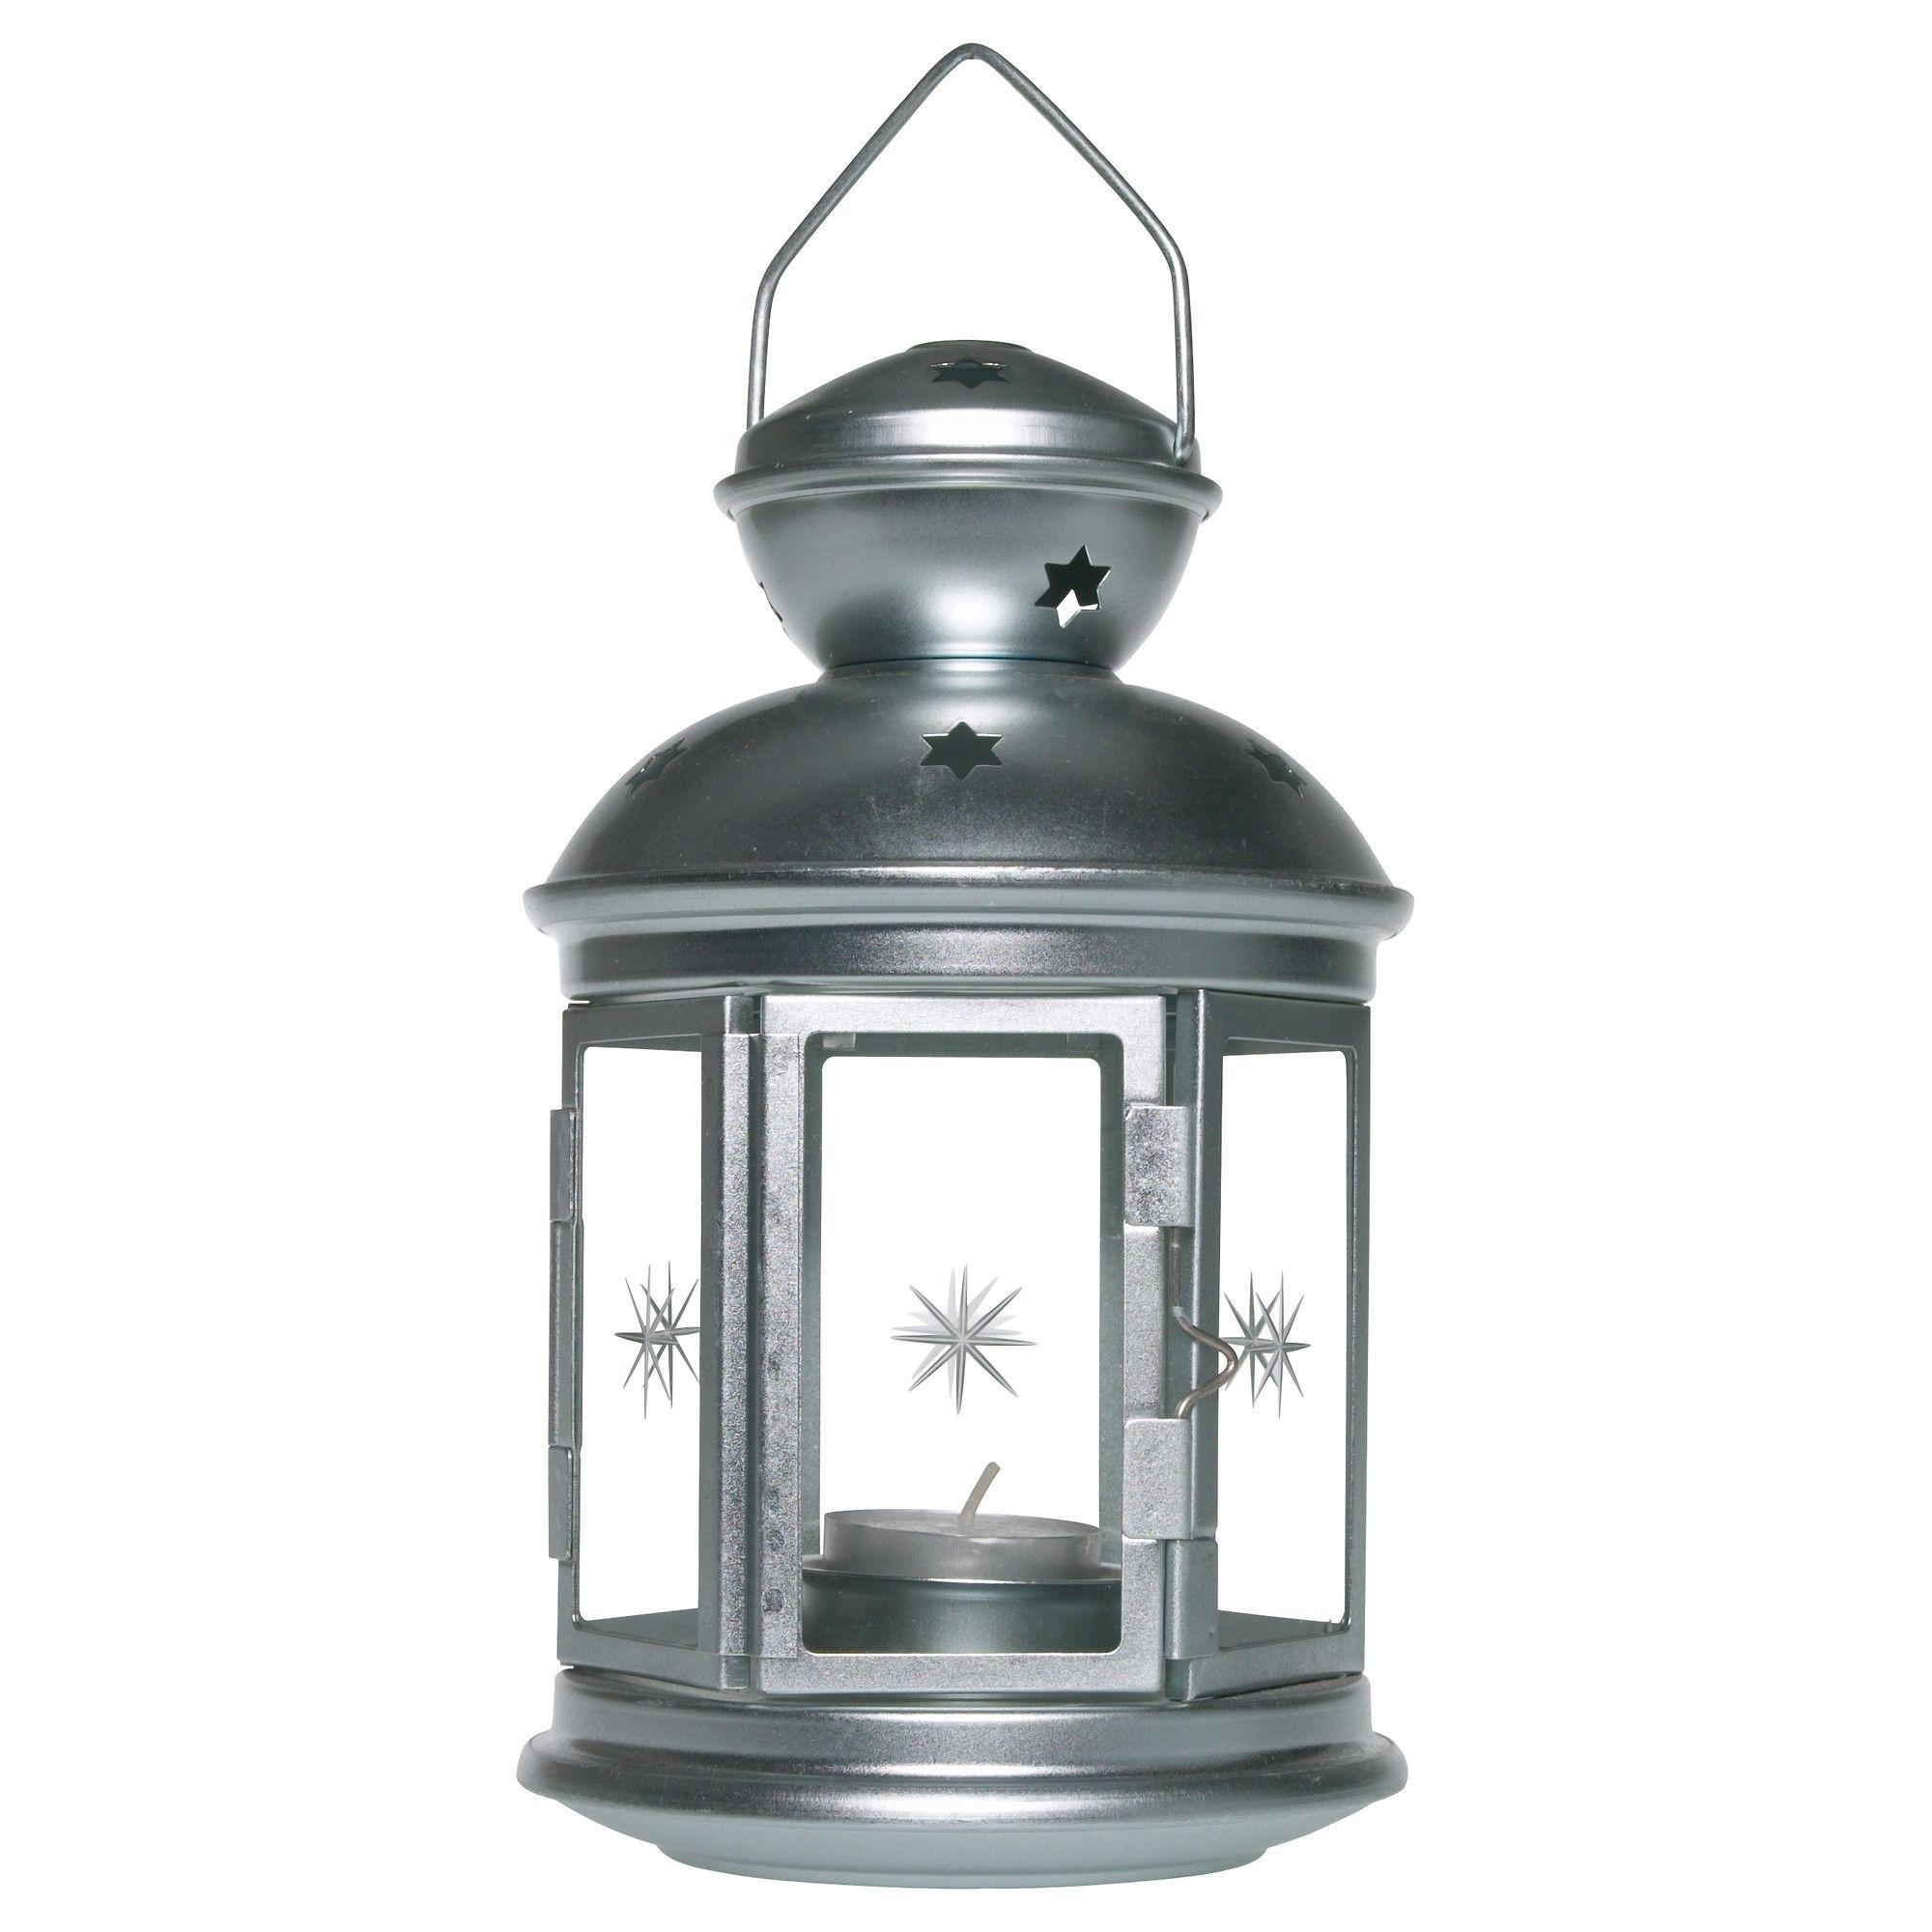 Rotera Lantern For Tealight, Galvanized Indoor/outdoor Galvanized in Ikea Outdoor Lanterns (Image 19 of 20)